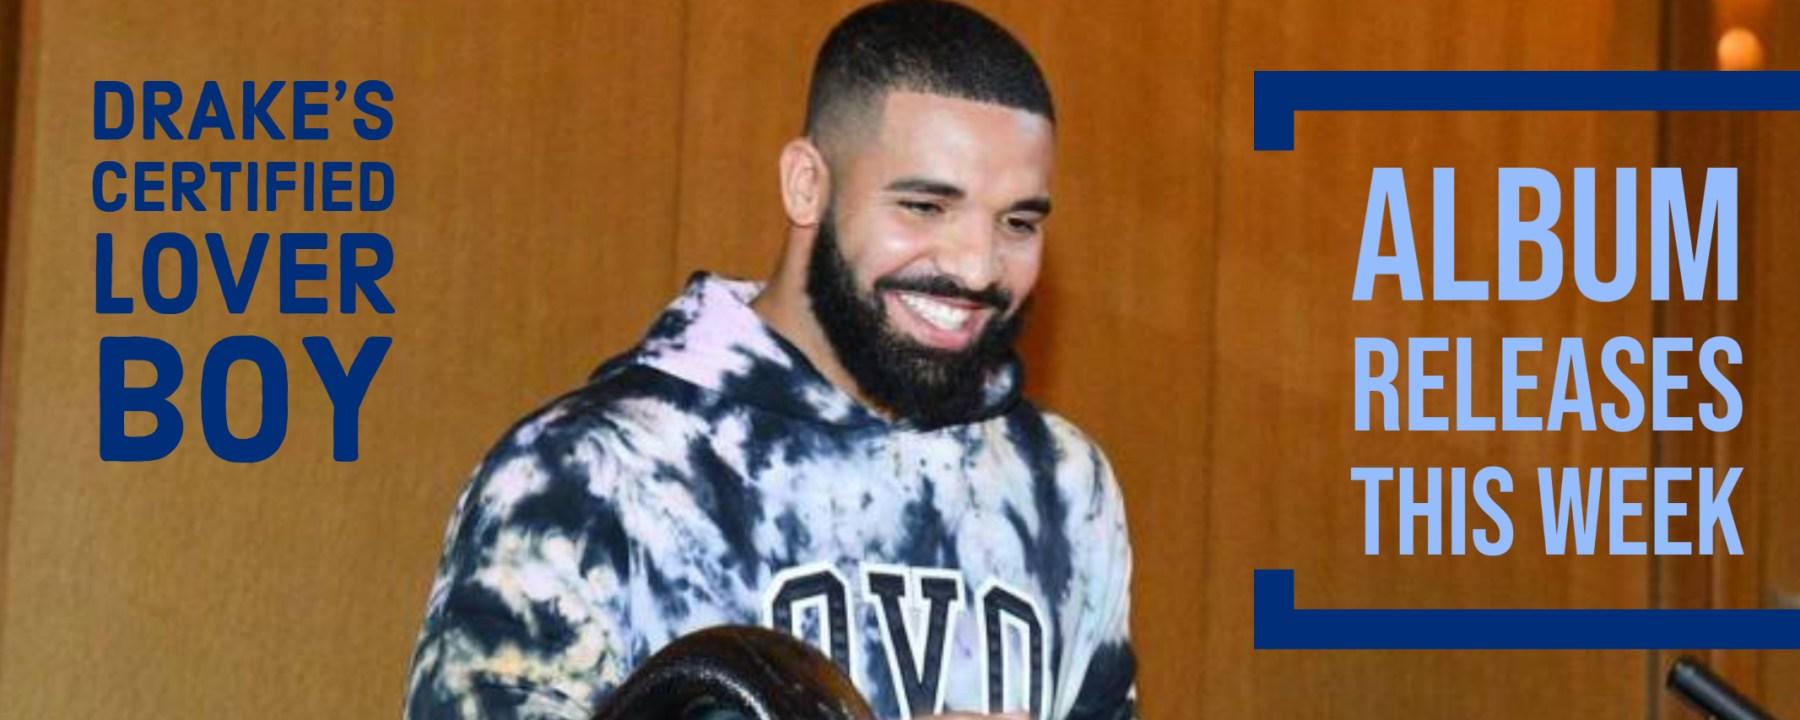 Drake's Certified Lover Boy